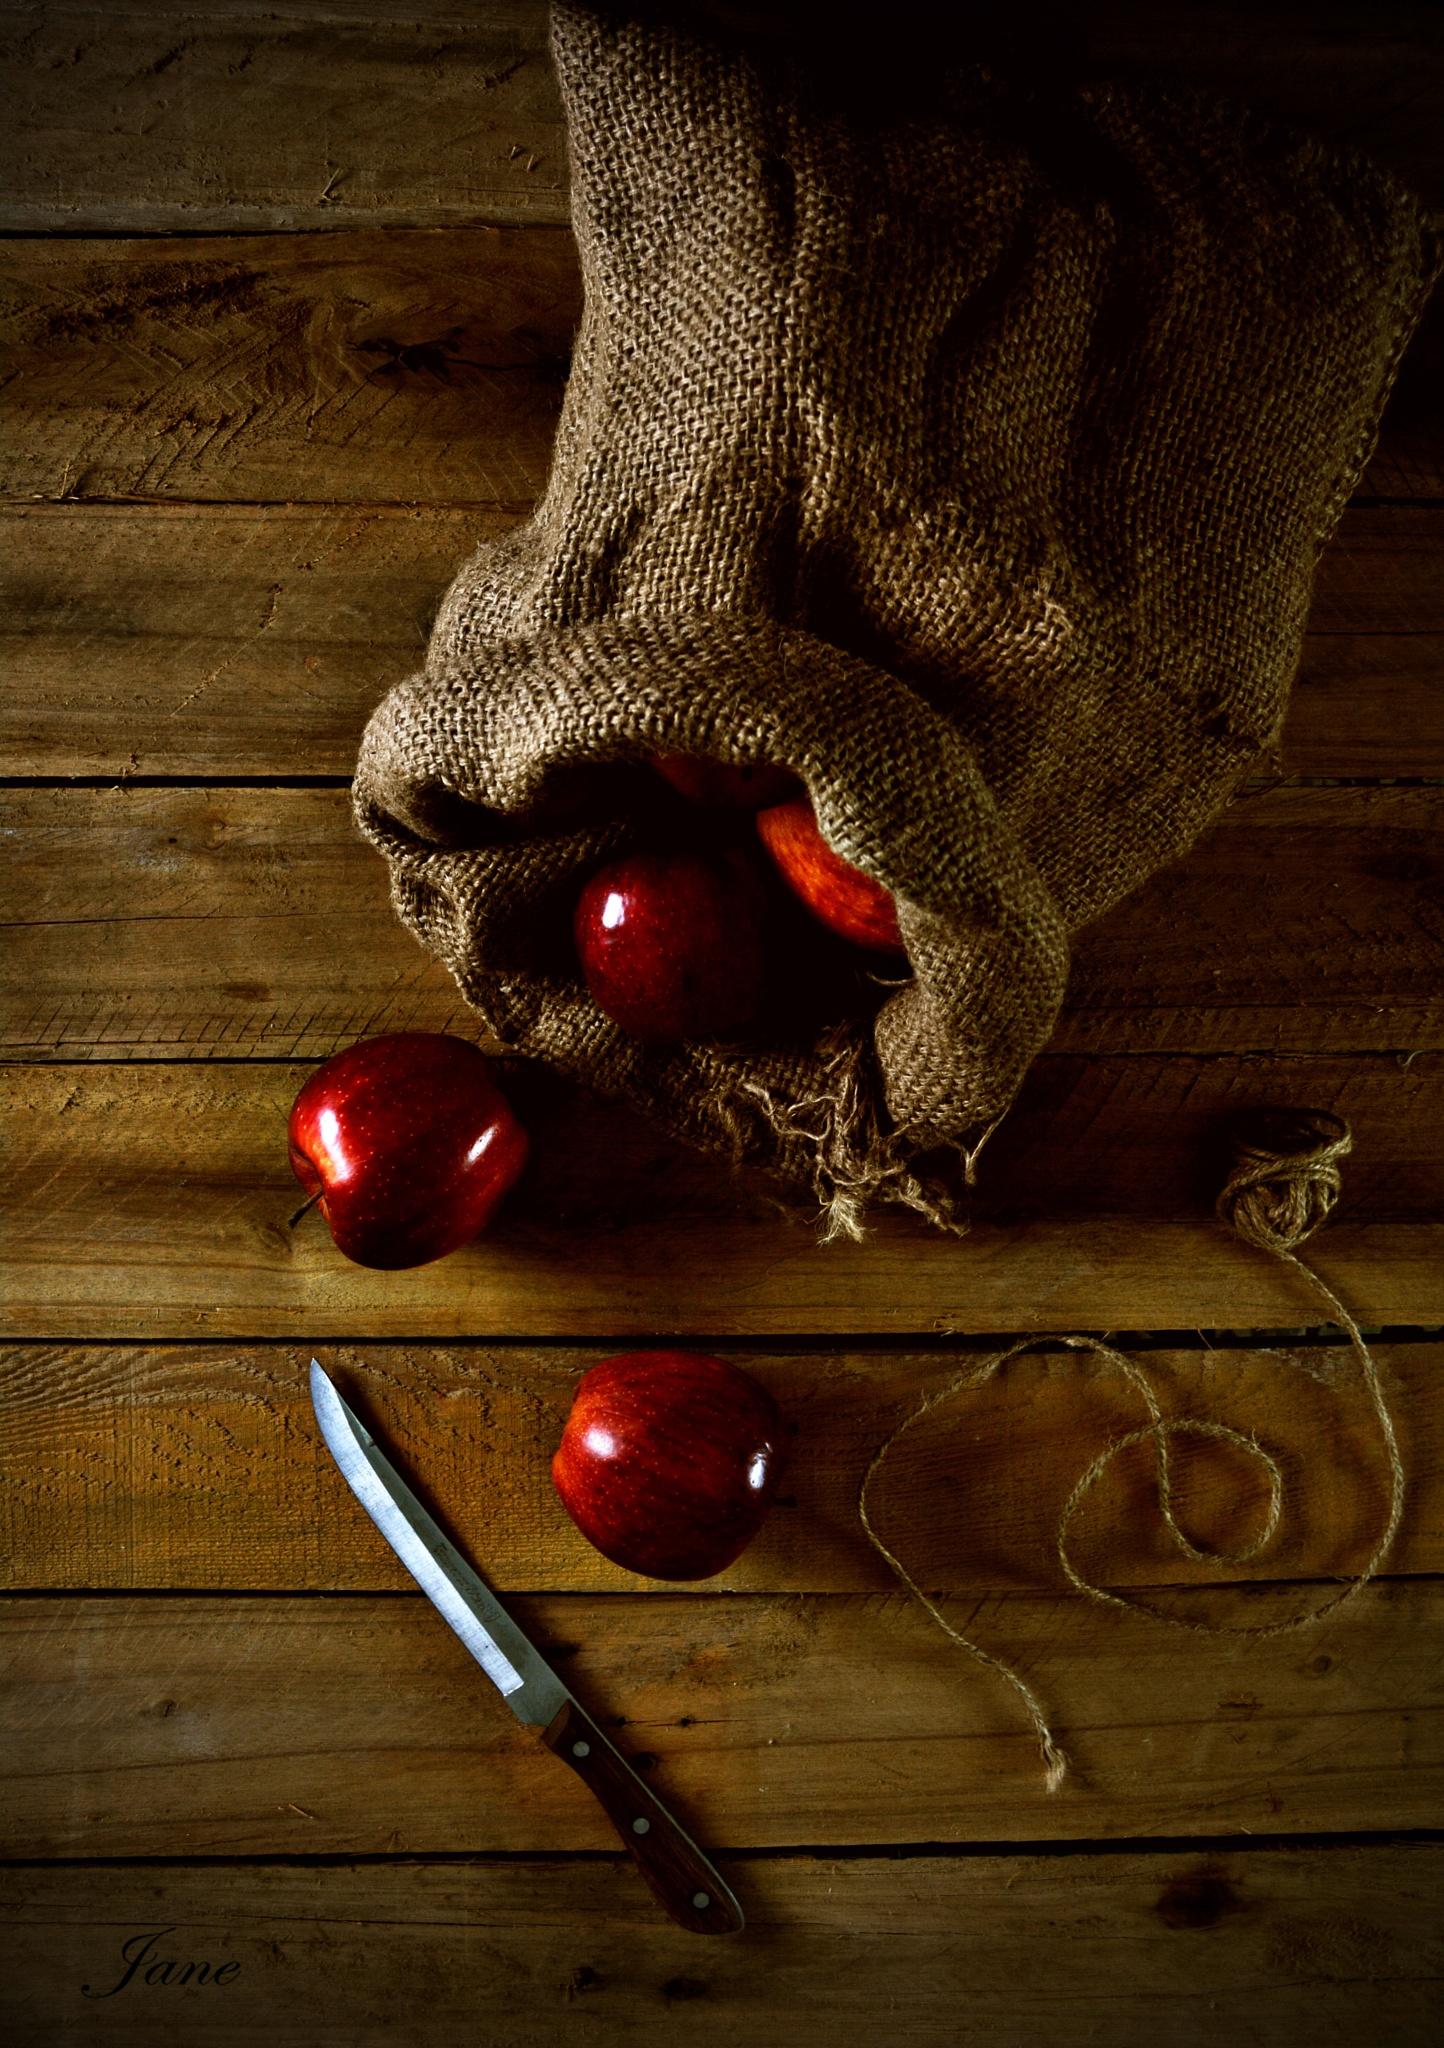 Apples by Jane Austen